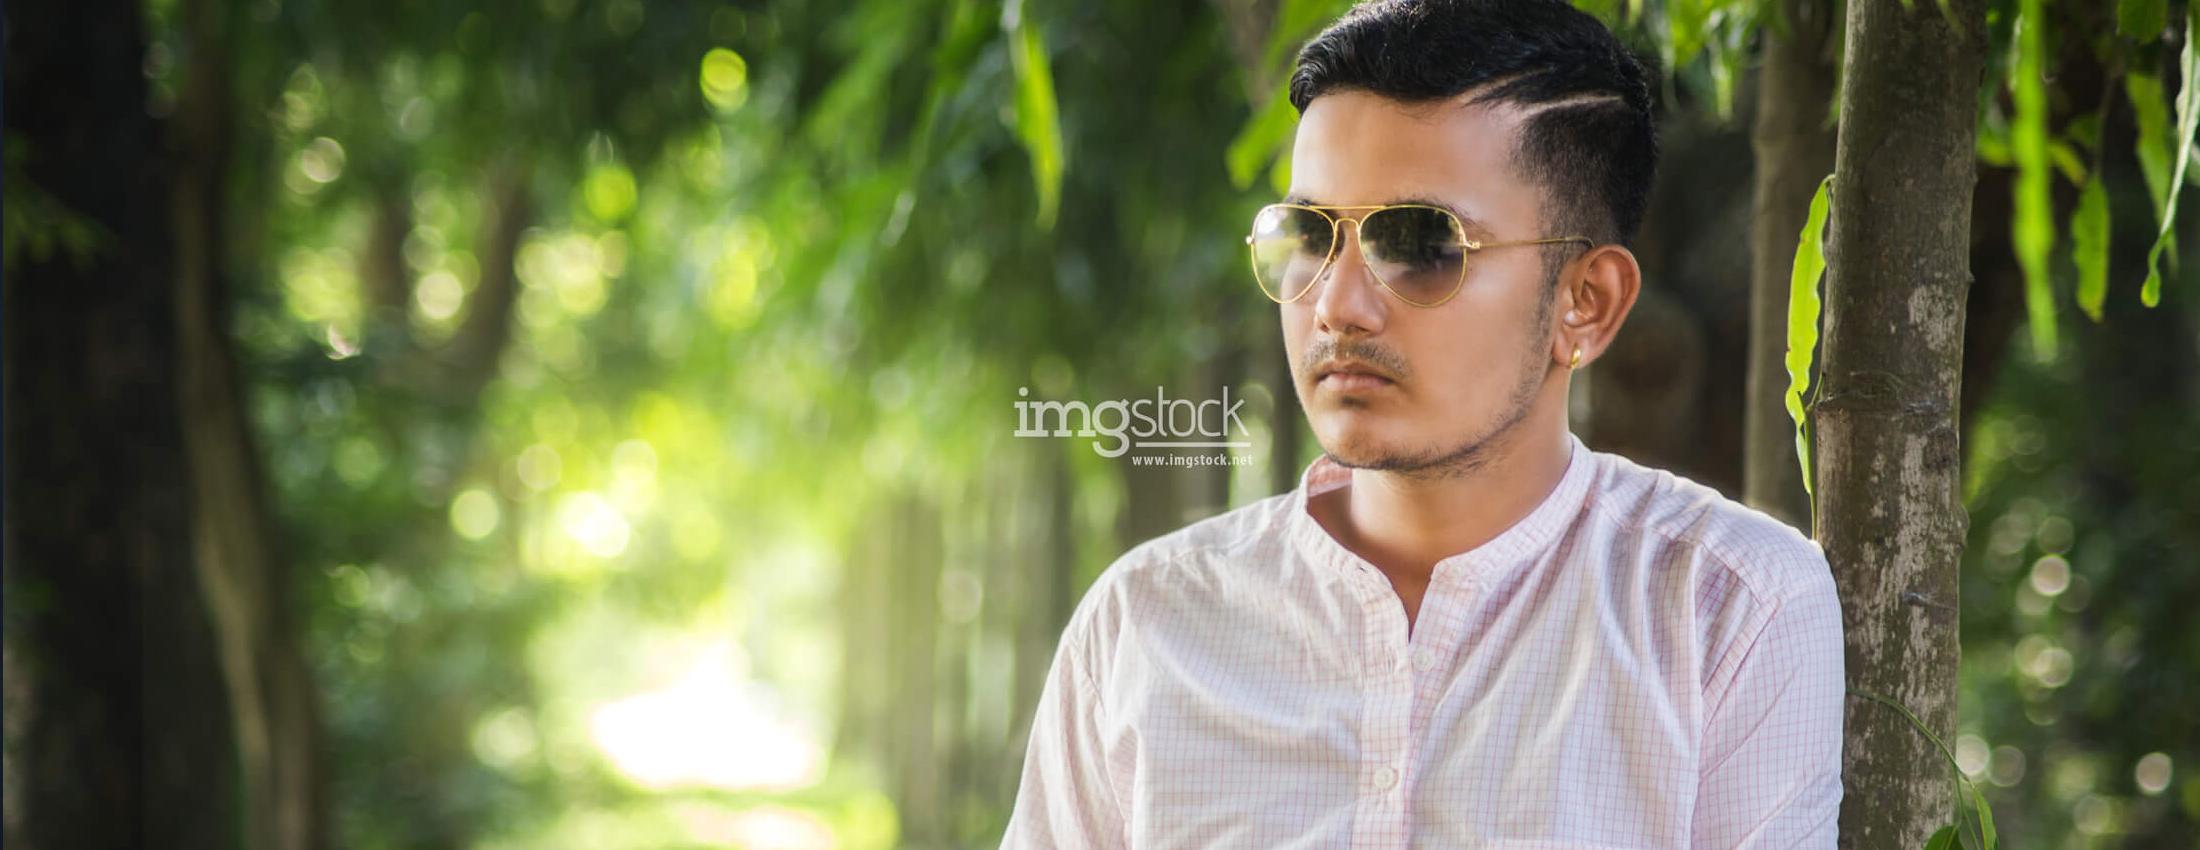 Vikalp Modeling Photoshoot - Imgstock, Biratnagar